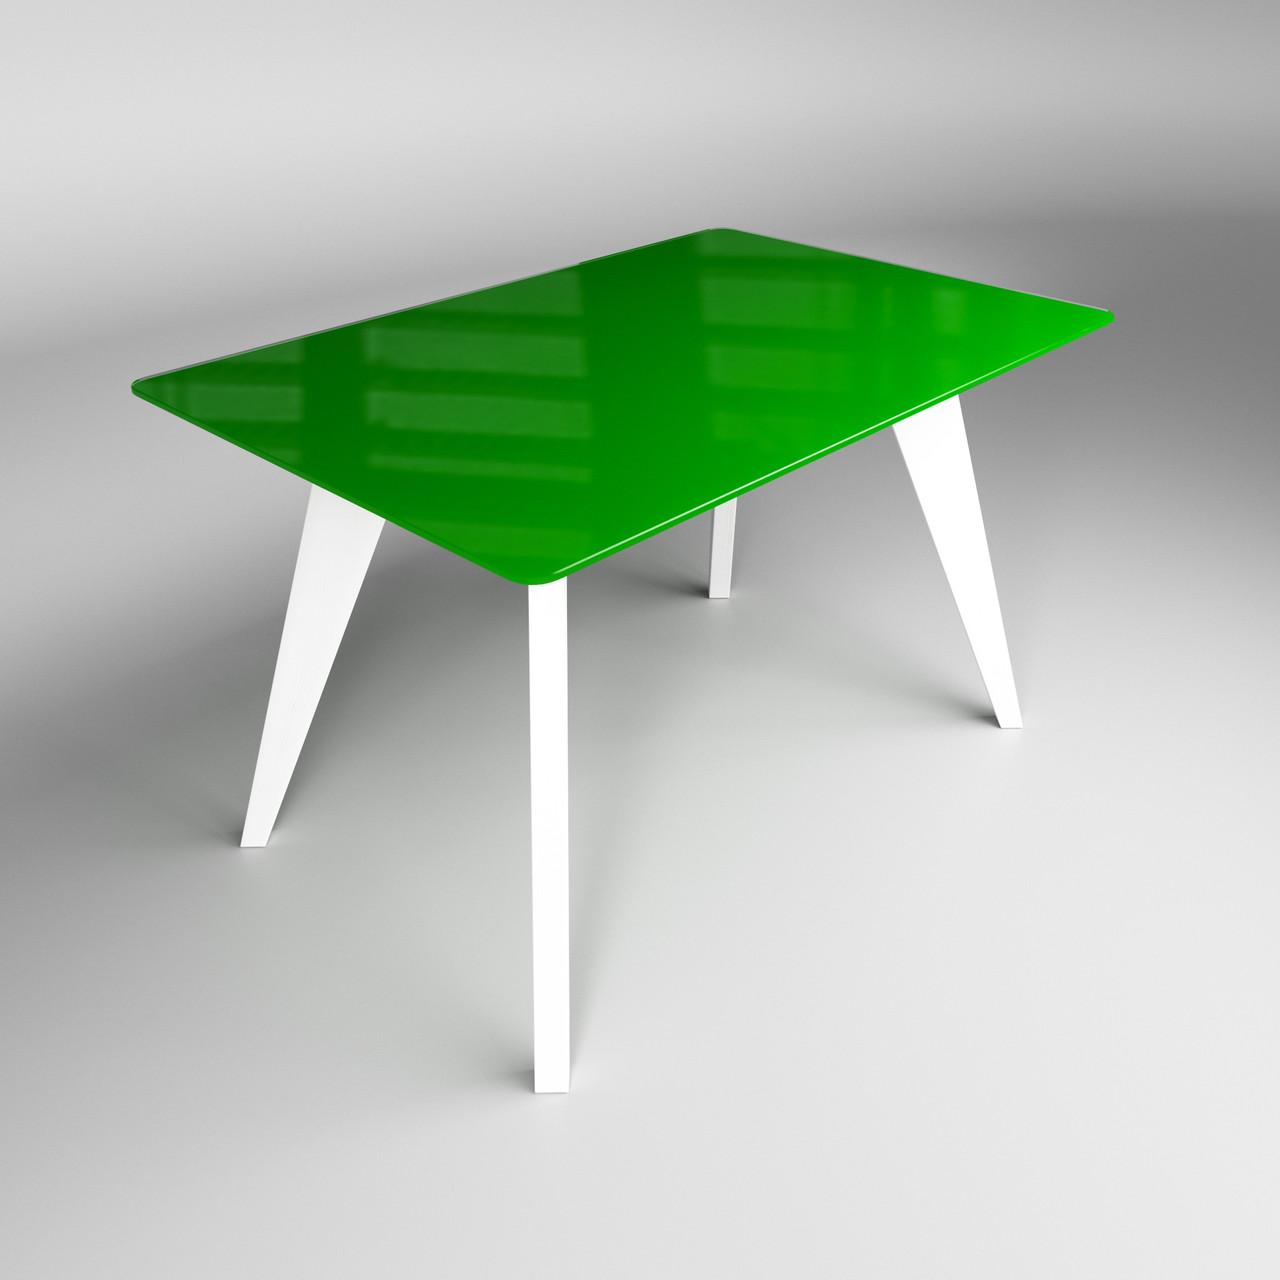 Стол Леонардо зелено-белый